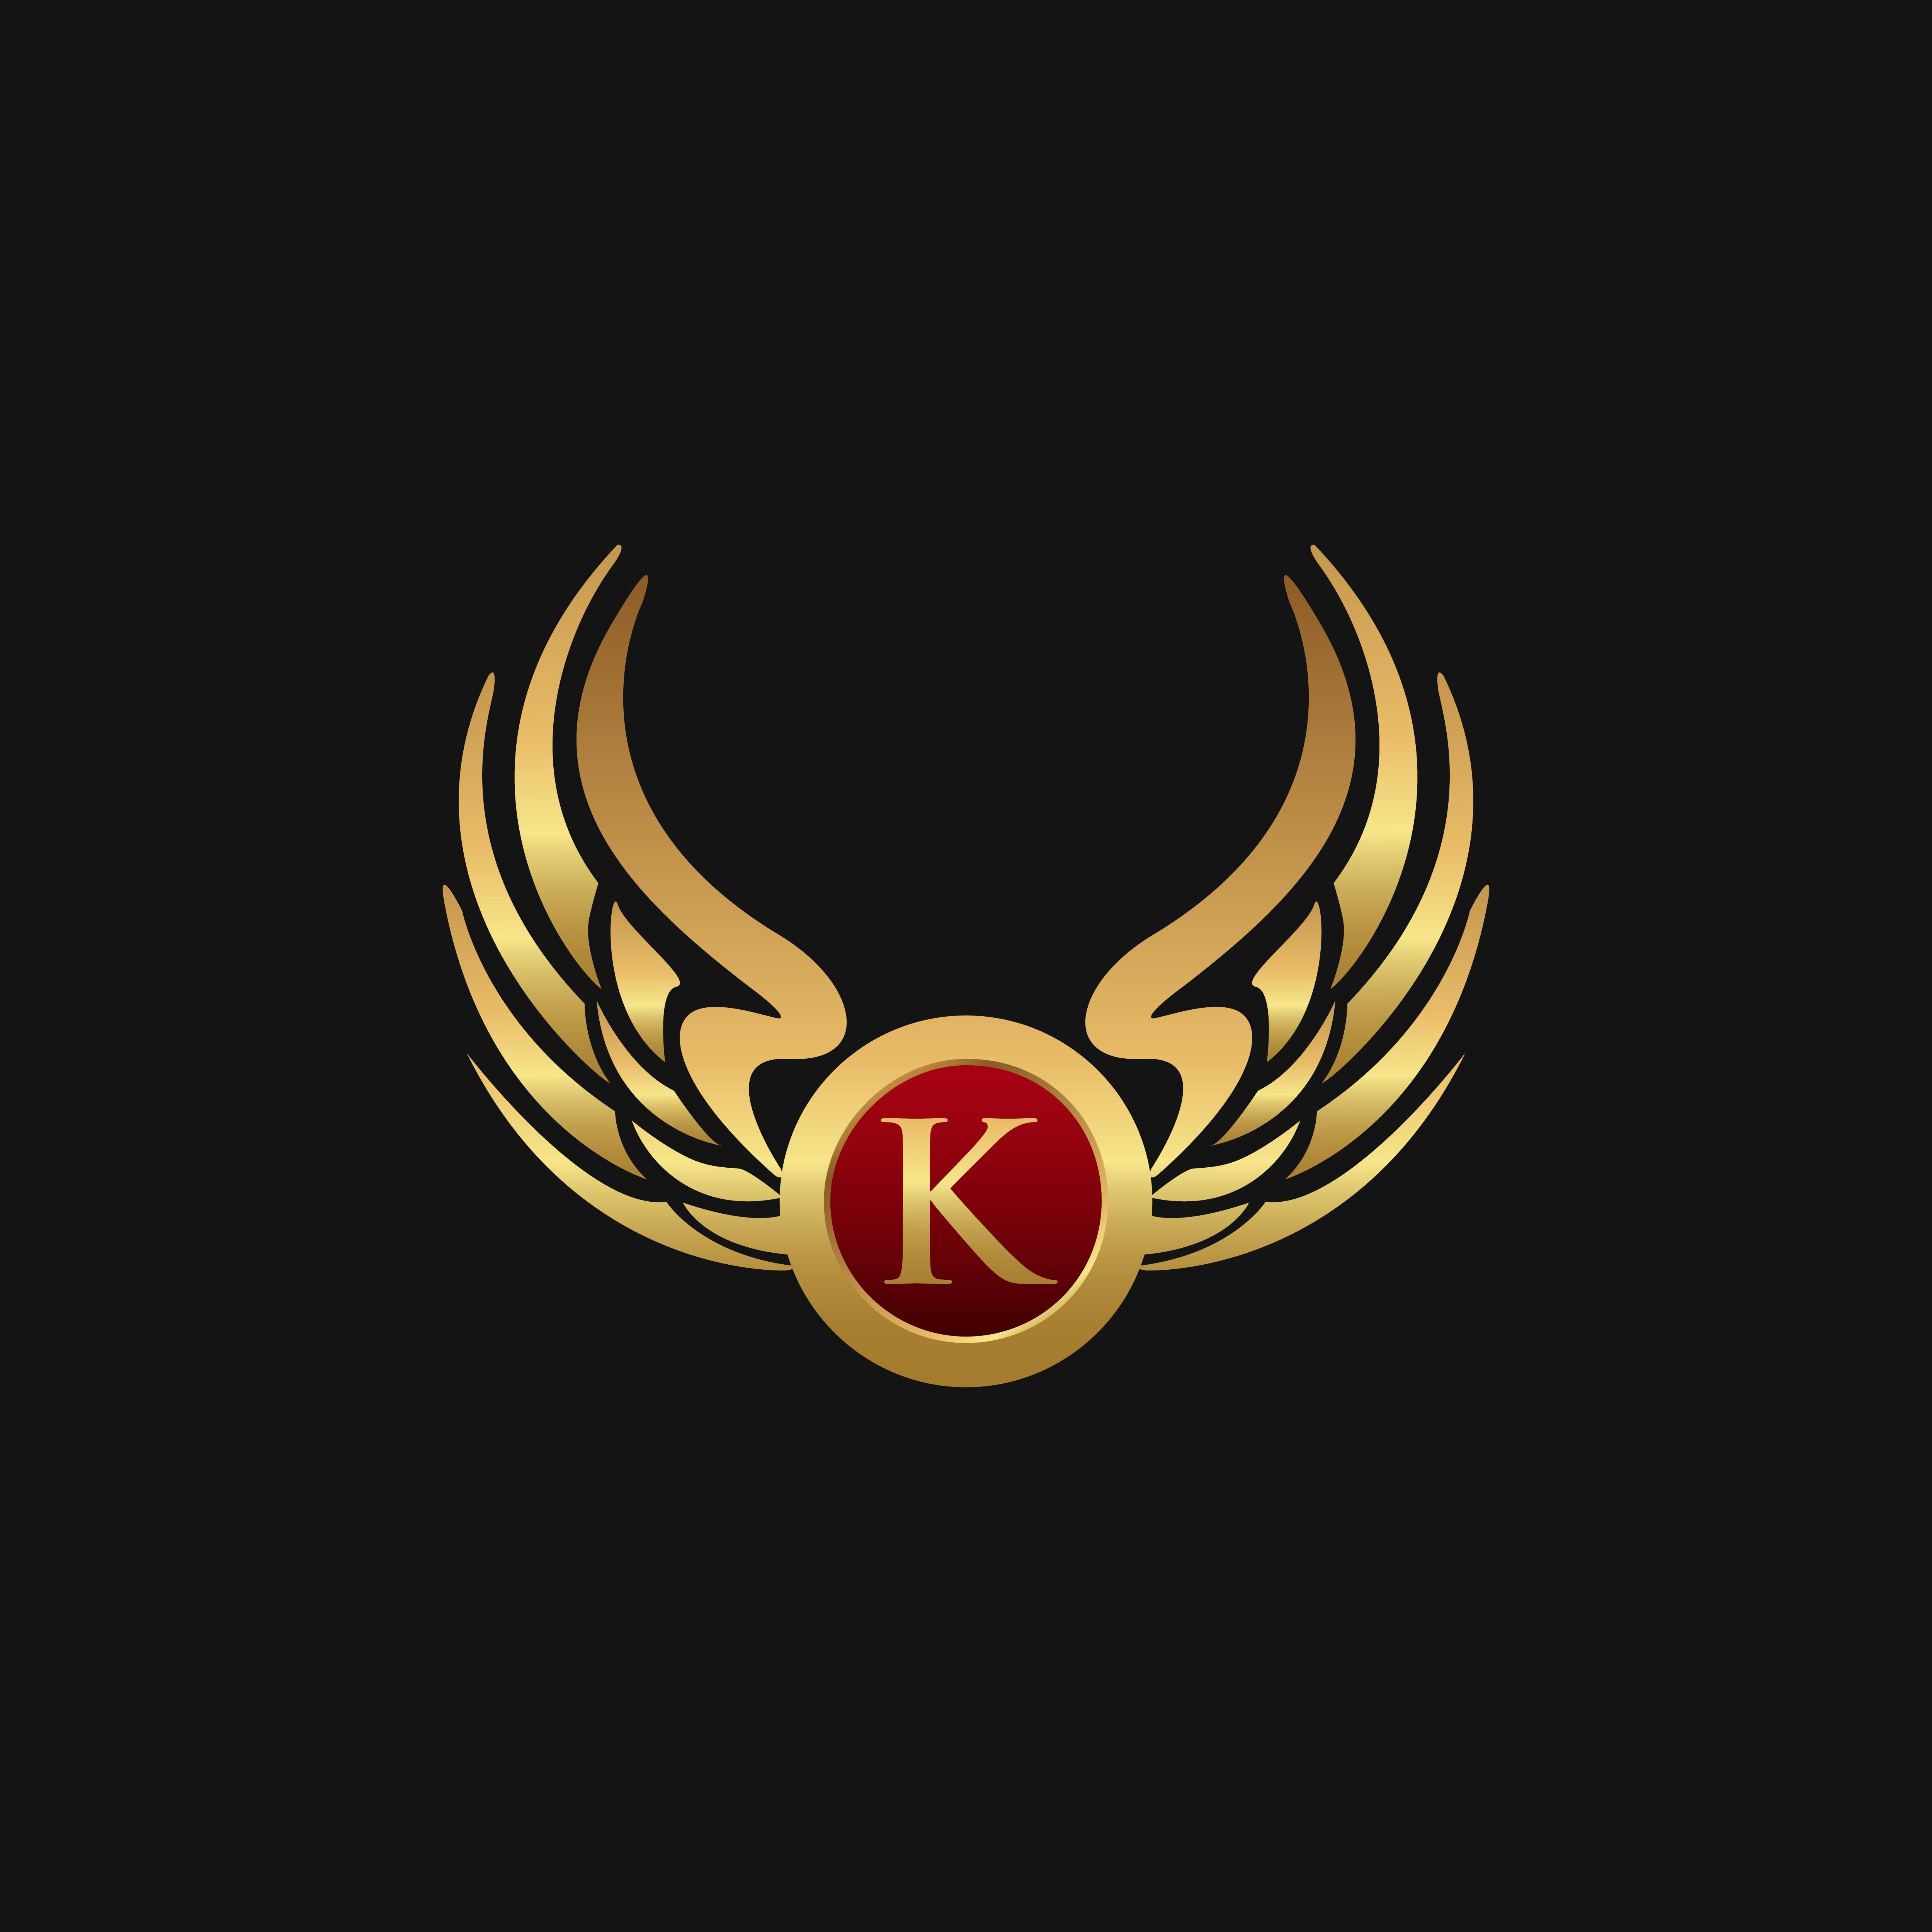 Luxury Letter K Emblem Wings Logo Design Concept Template